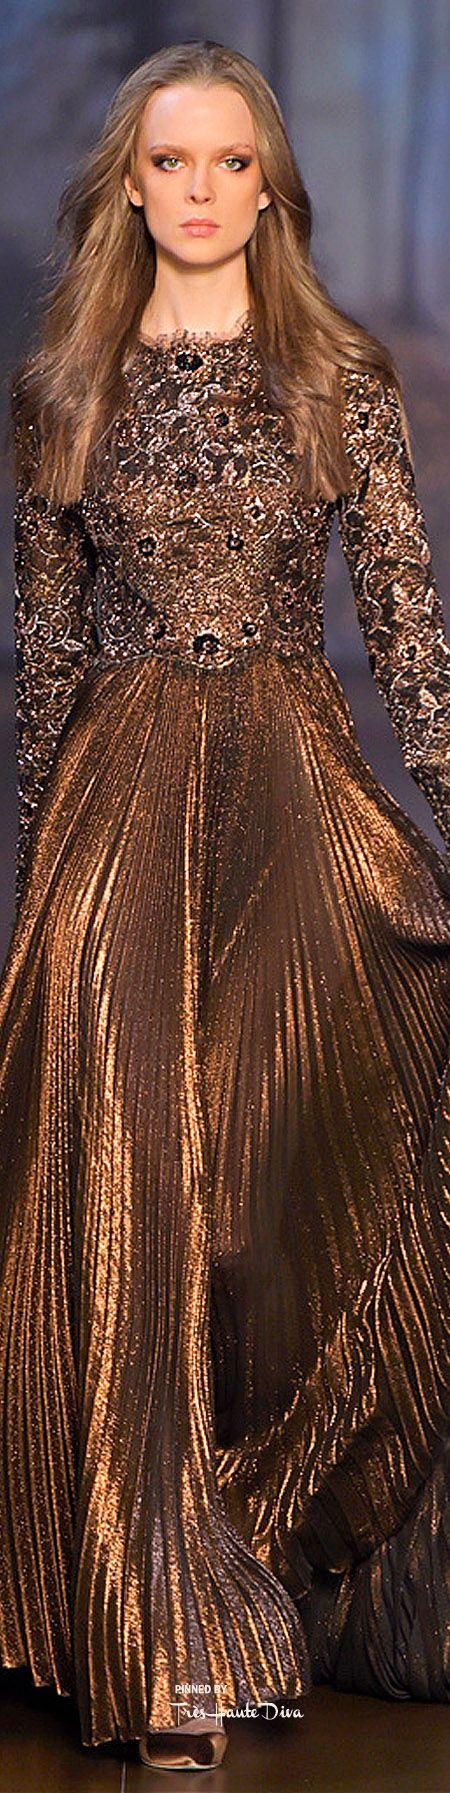 215 best Get down brown! images on Pinterest   Elegance fashion ...